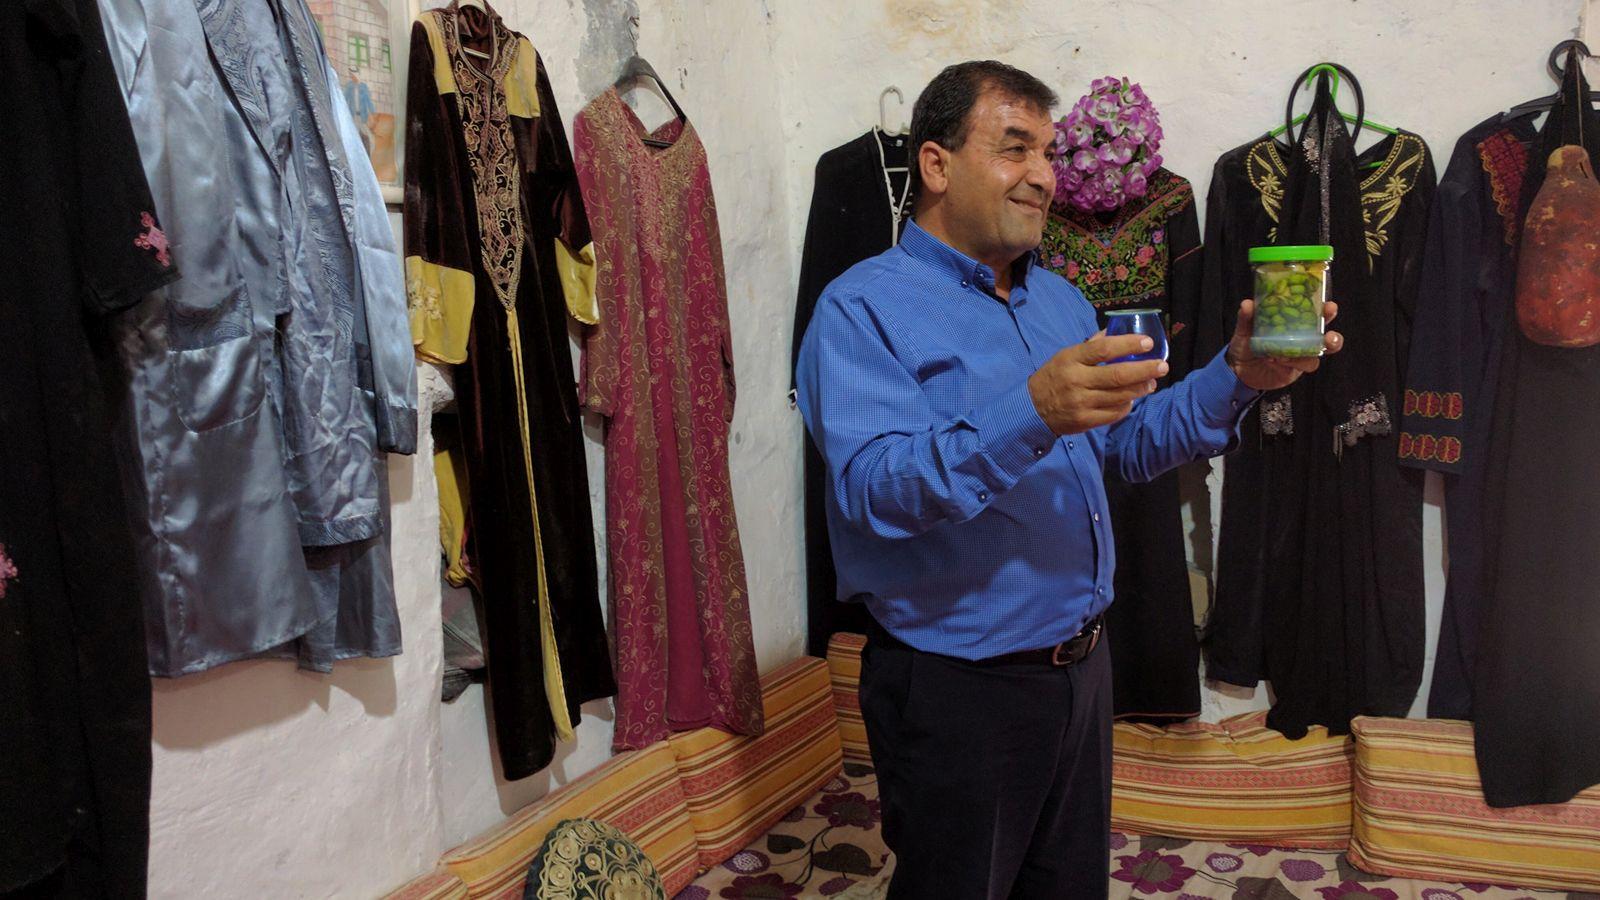 Dr. Mazen Ali talking olive oil in Deir Hanna. Photo by Viva Sarah Press